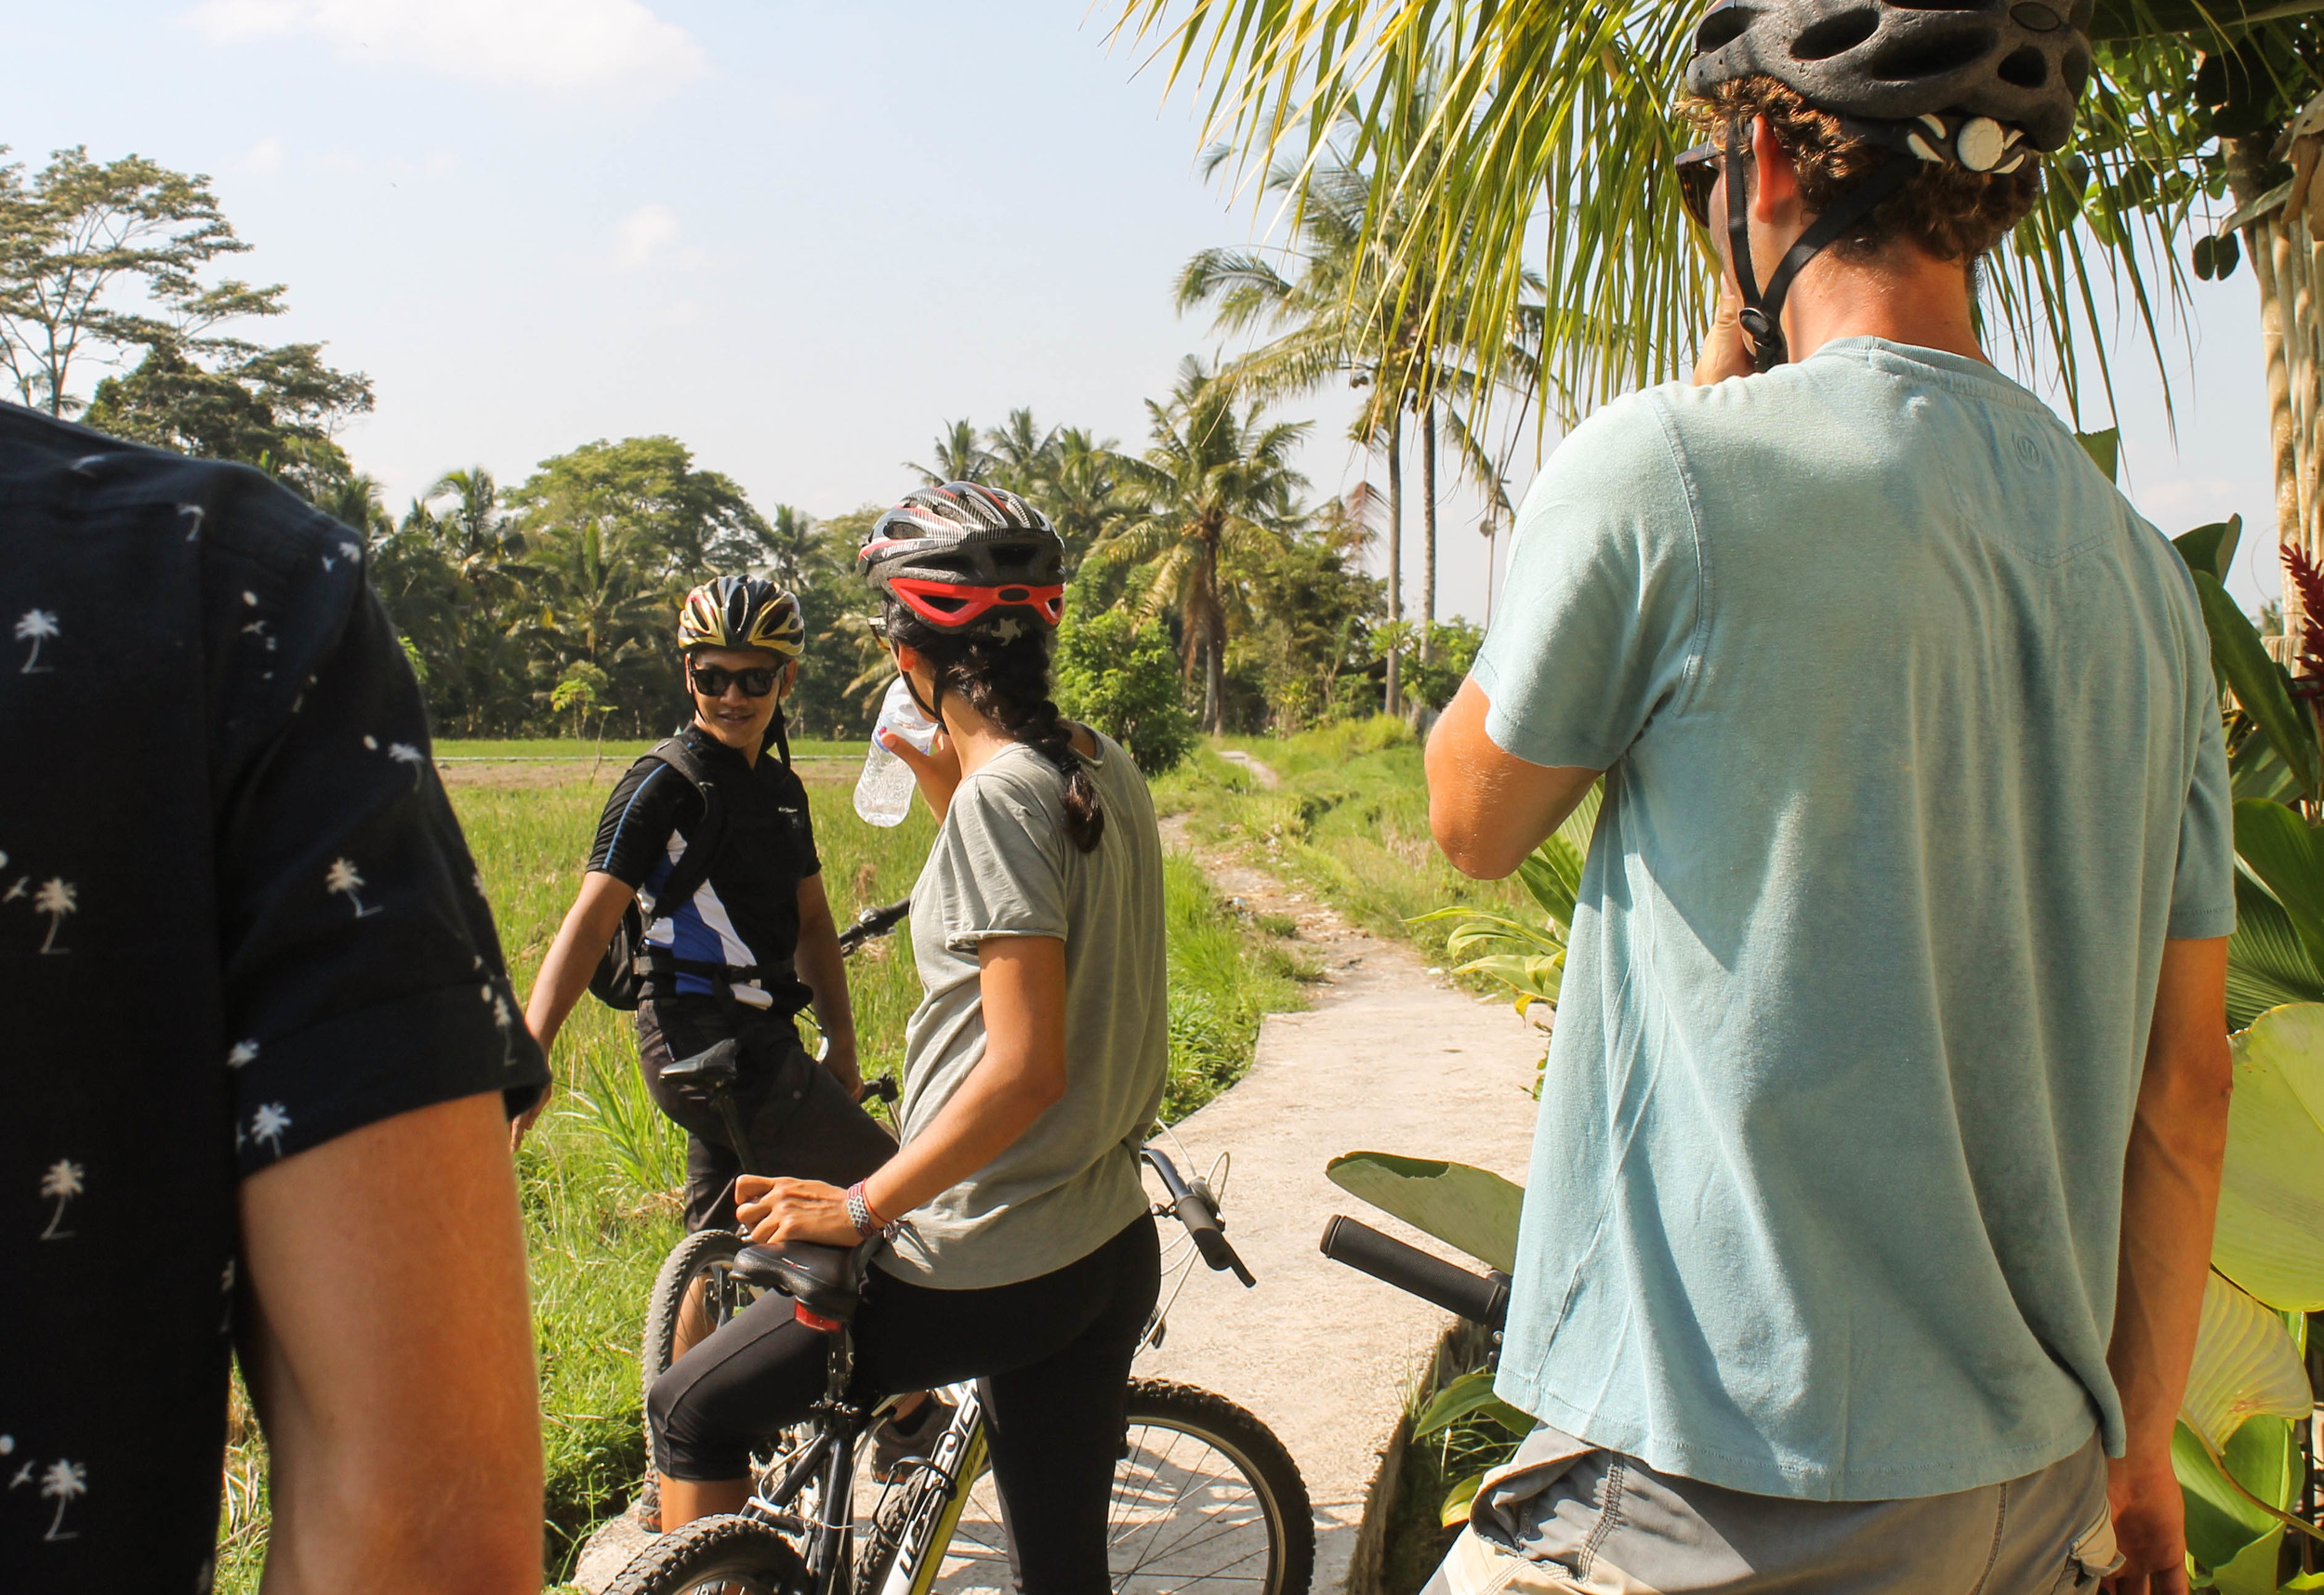 Adri-Bike